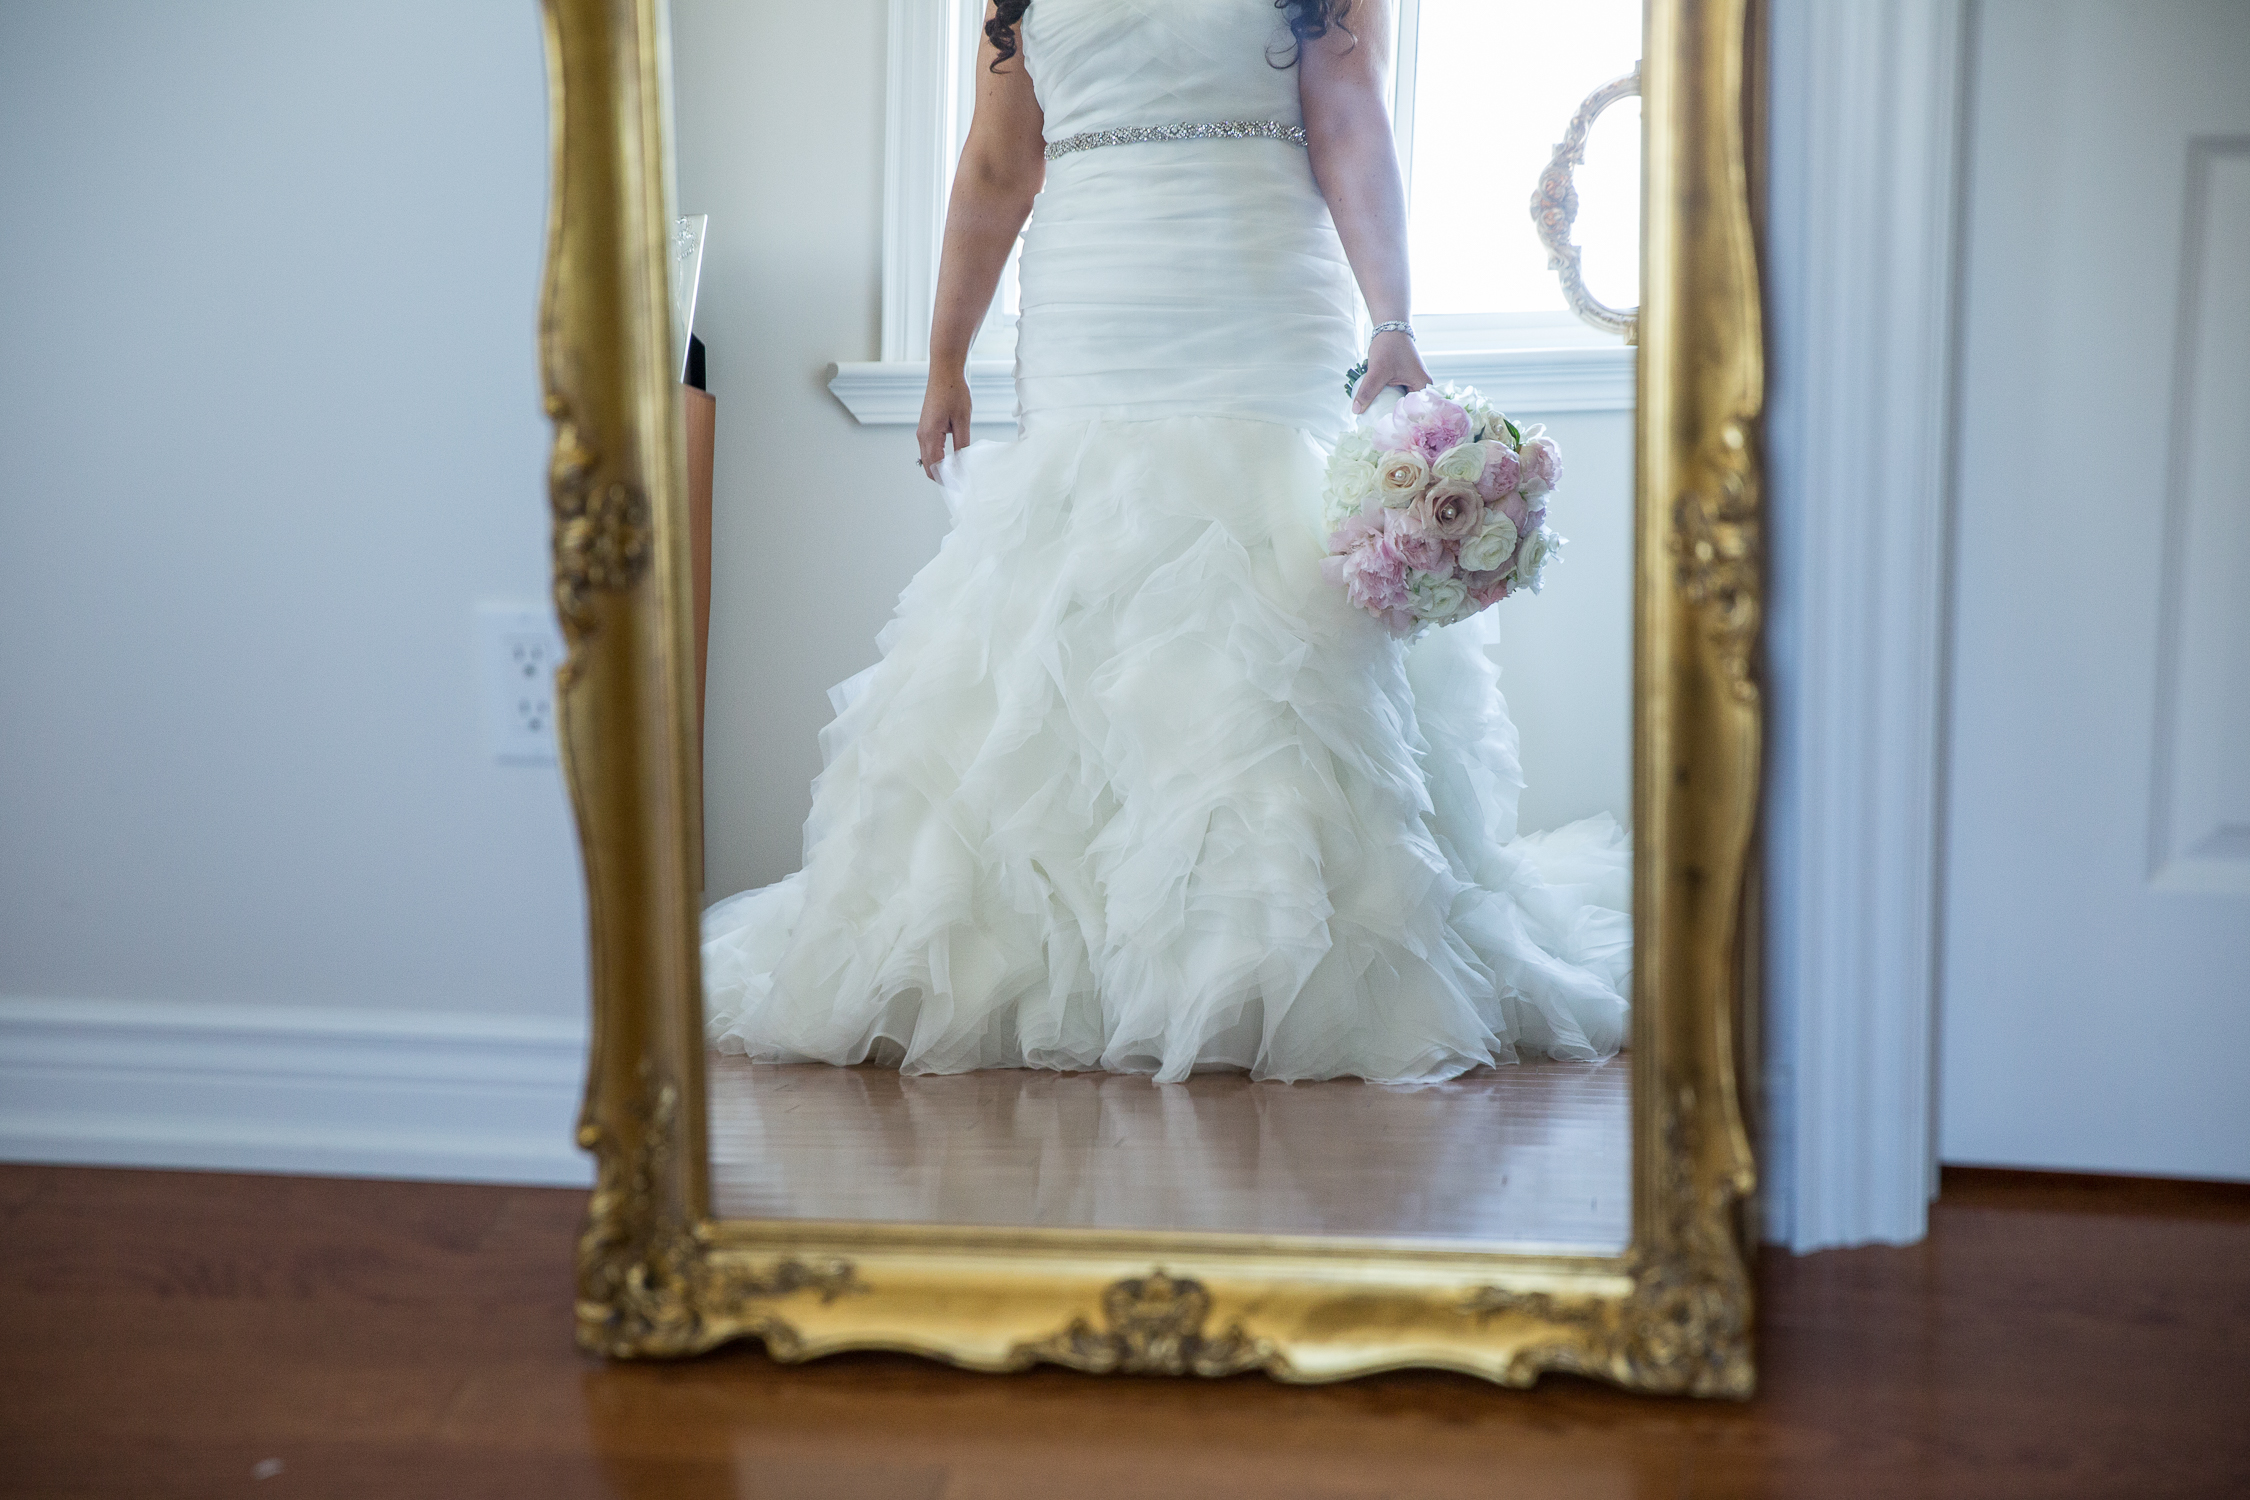 Peter-and-Marie-Wedding-Fontana-Primavera-Graydon-Hall-Manor-Toronto-Ontario-Canada-0010.jpg